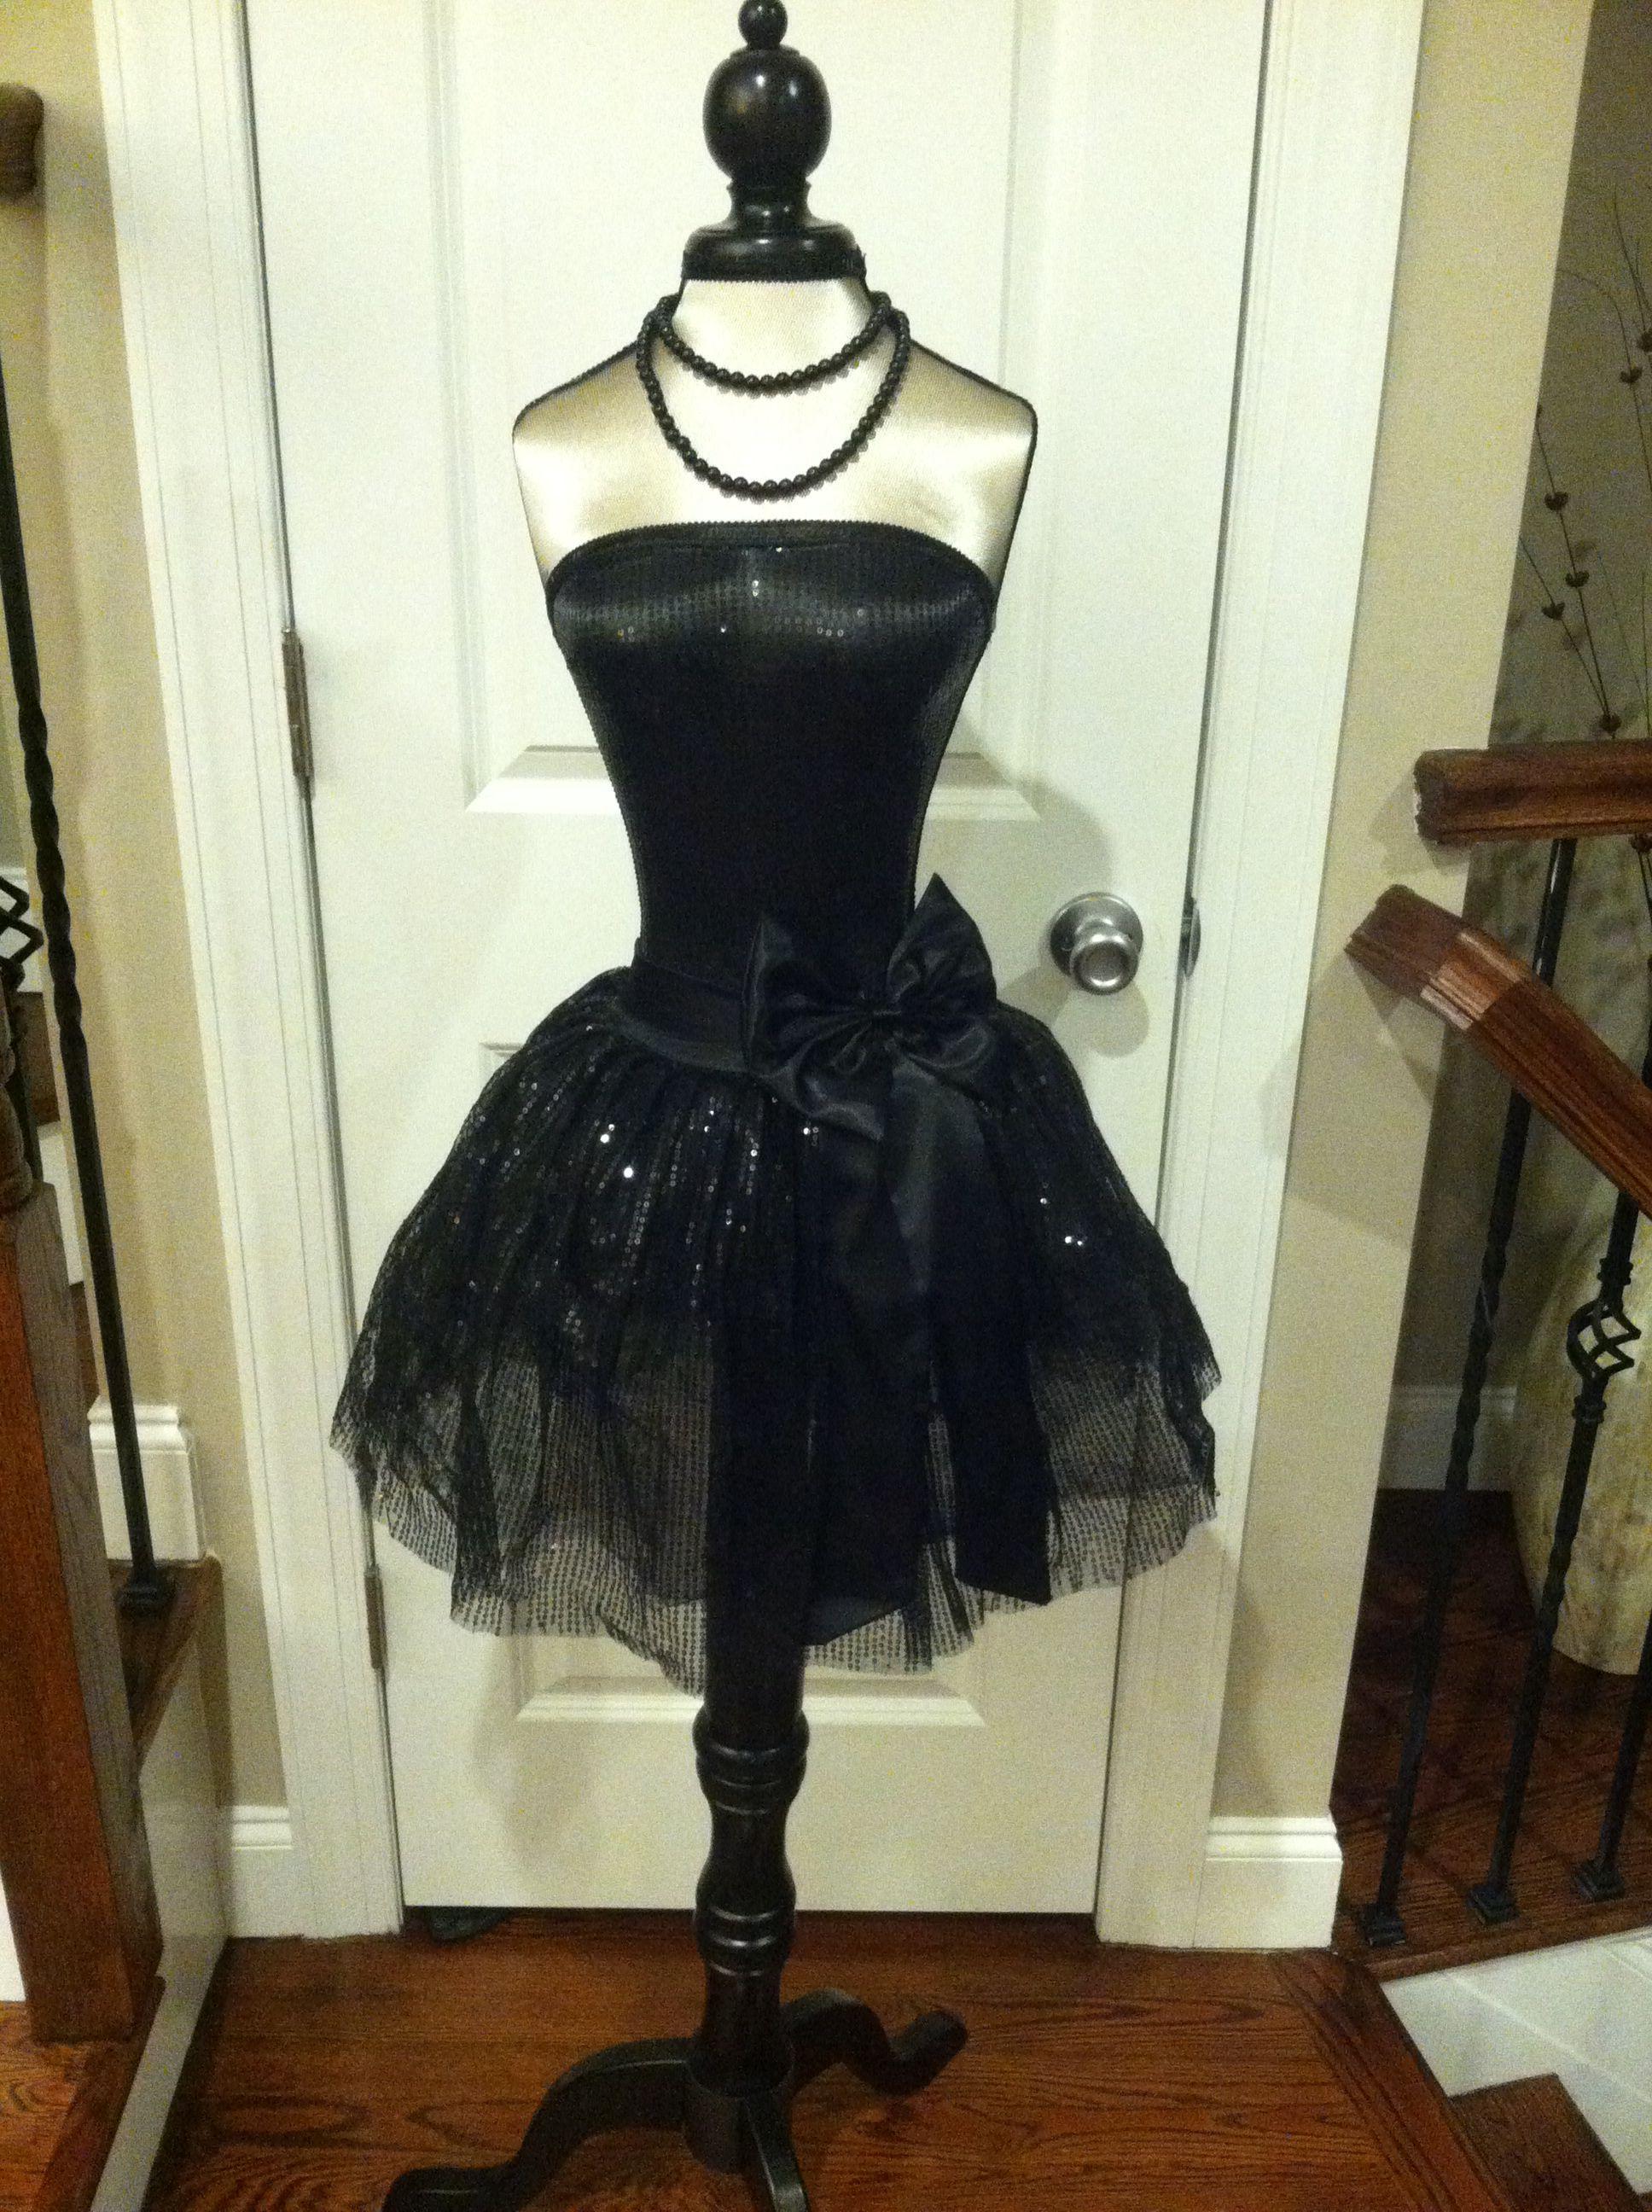 My Little Black Dress Themed Bridal Shower Mannequin